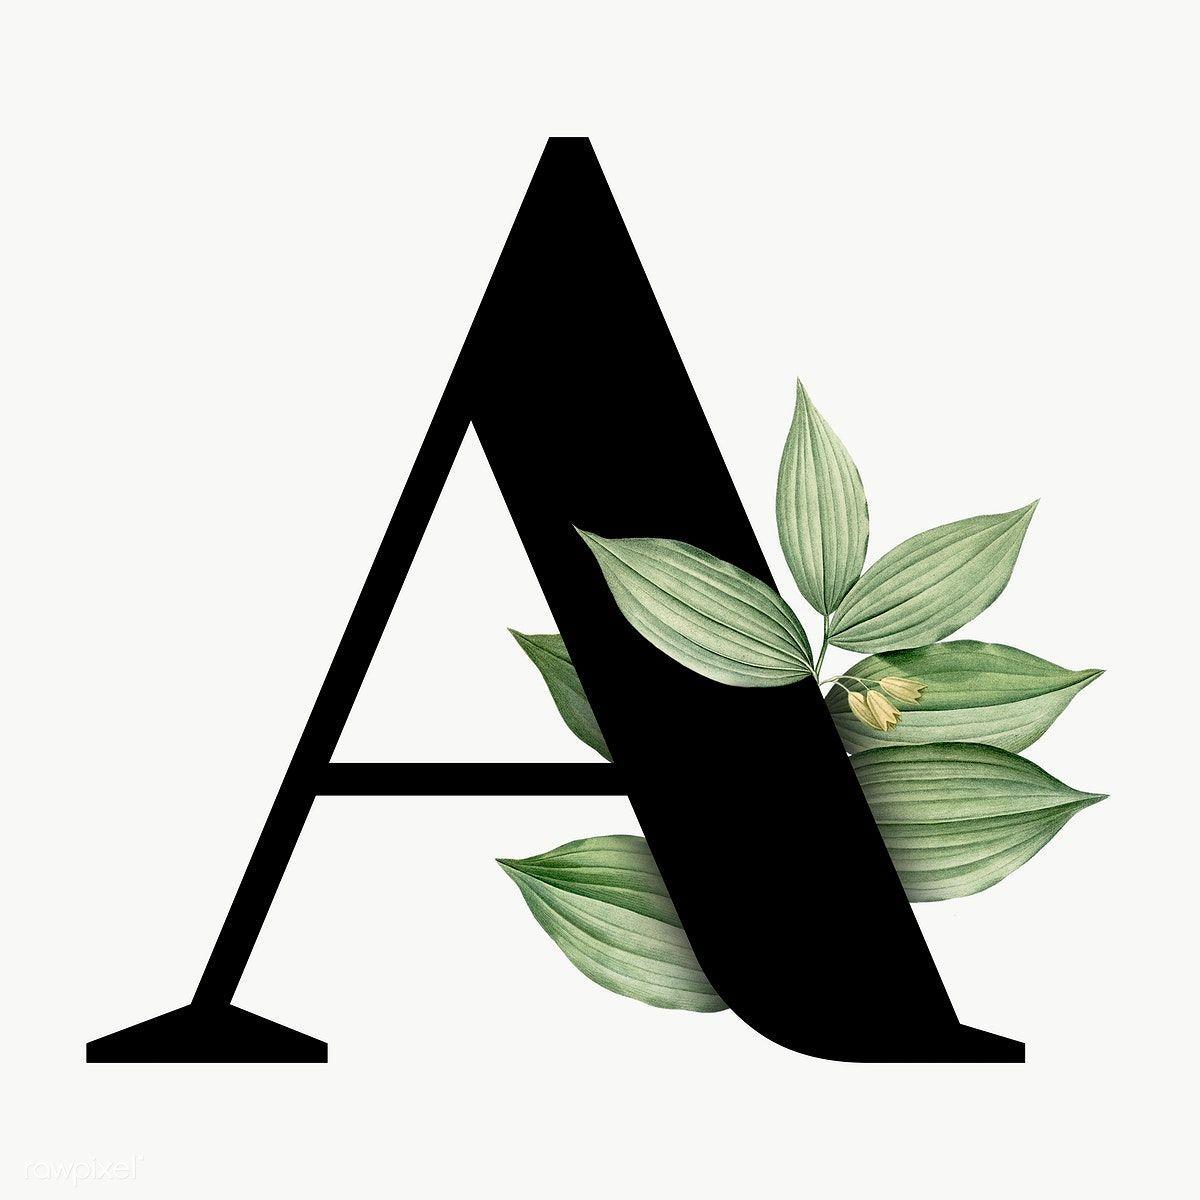 Pin By Tina Iwan On Inspiracje Nadruki Hafty Alphabet Wallpaper Monogram Wallpaper Lettering Alphabet Fonts